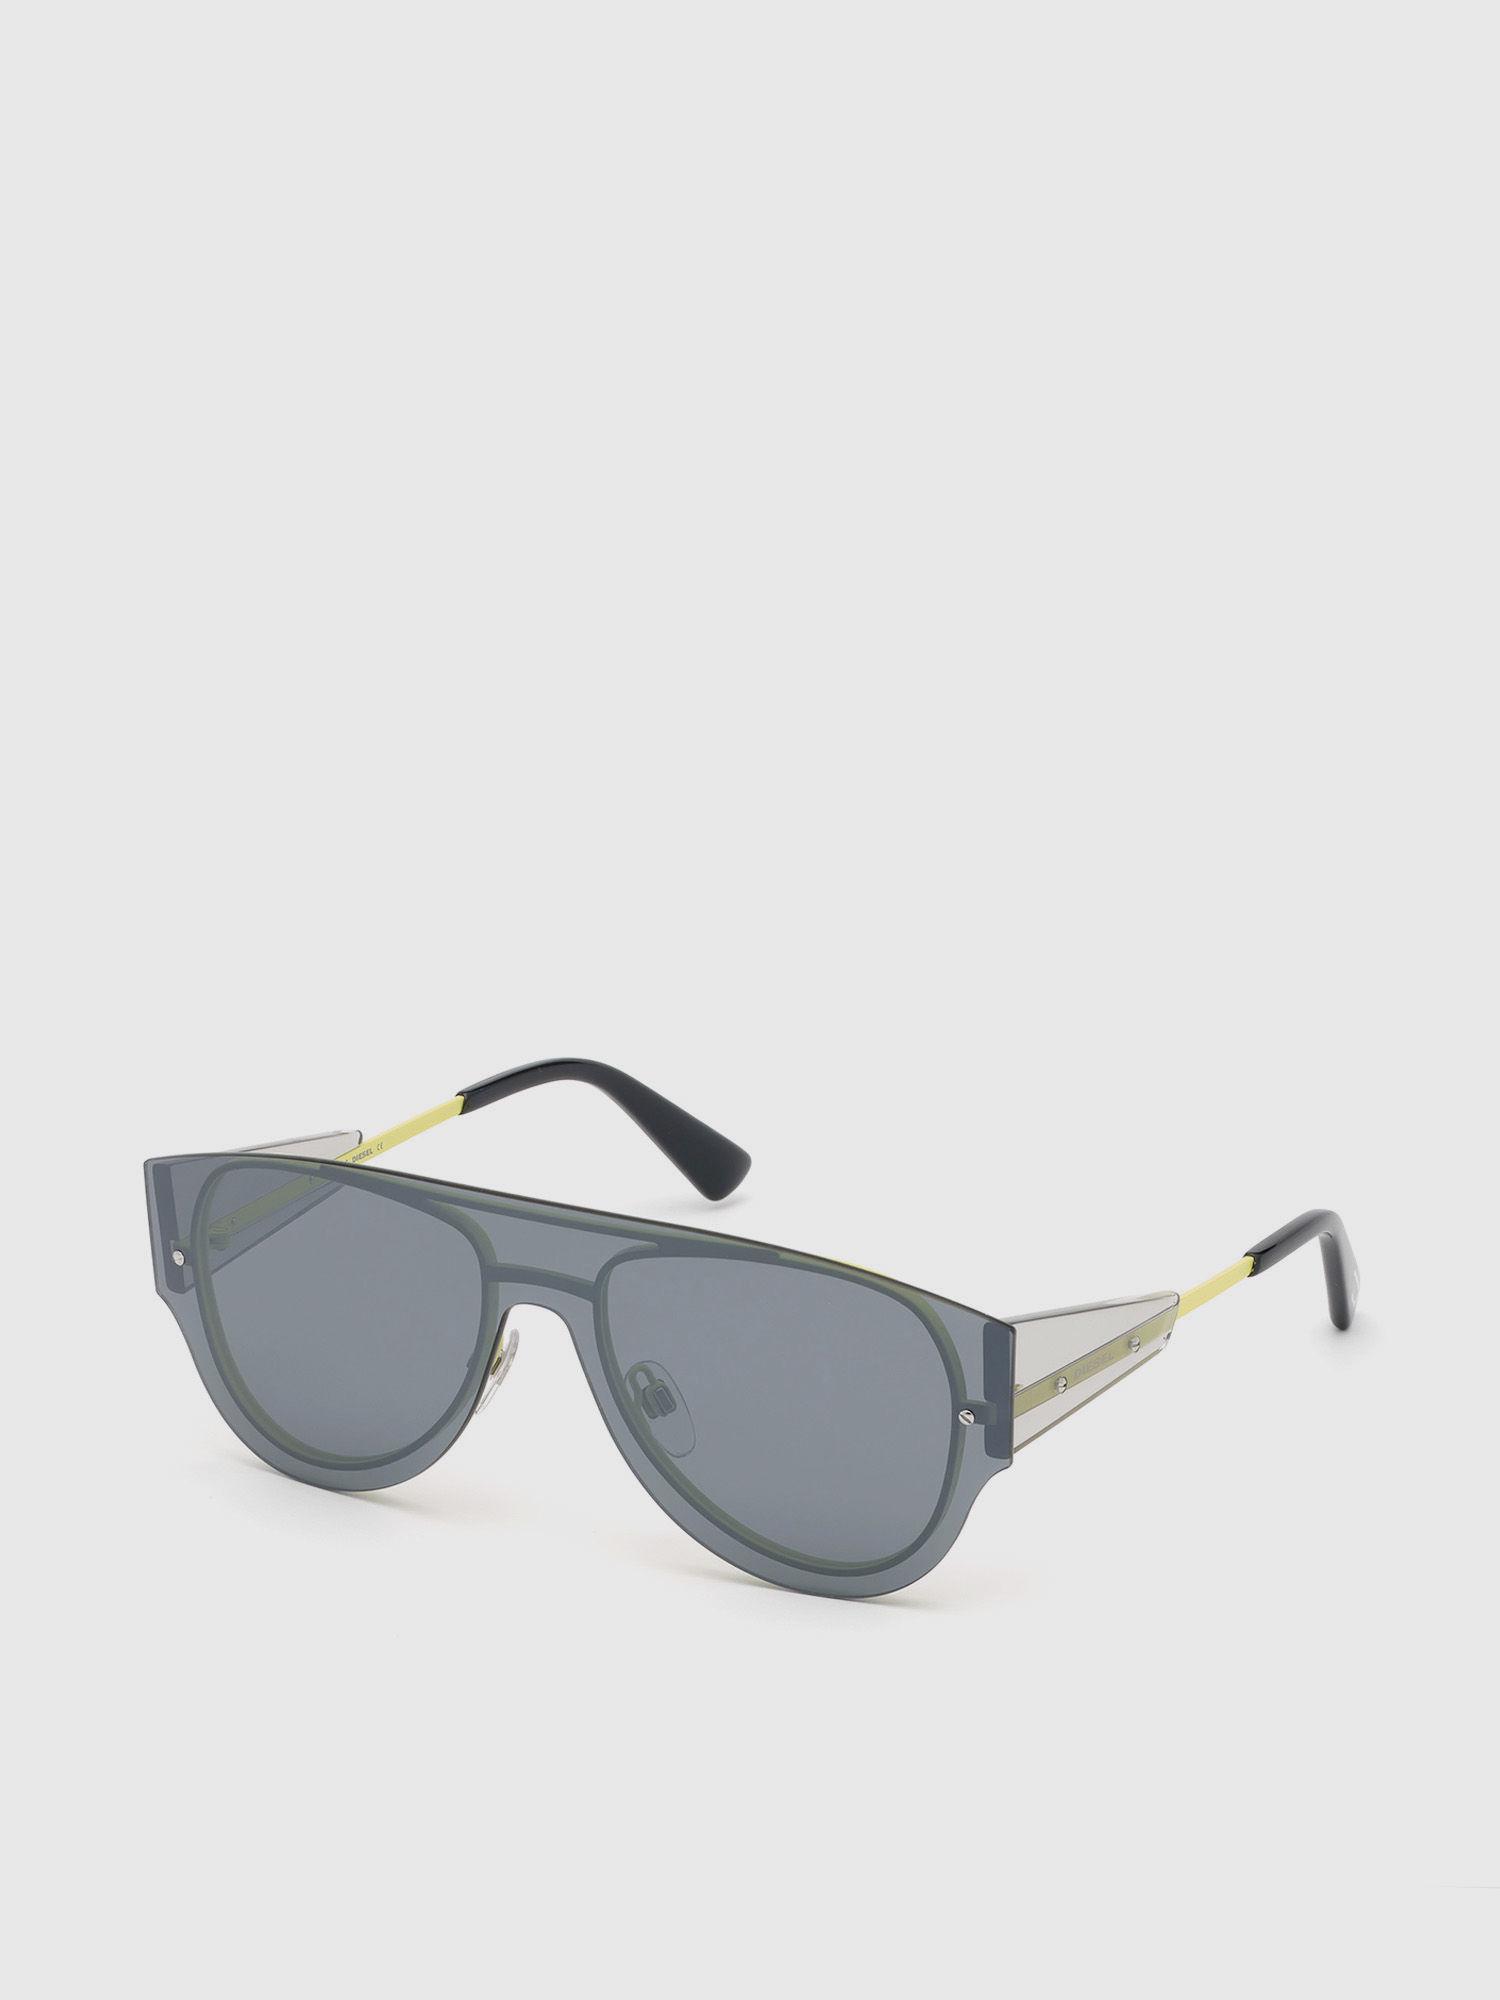 6054b20097a Diesel Pilot Shape Sunglasses In Metal - Lyst